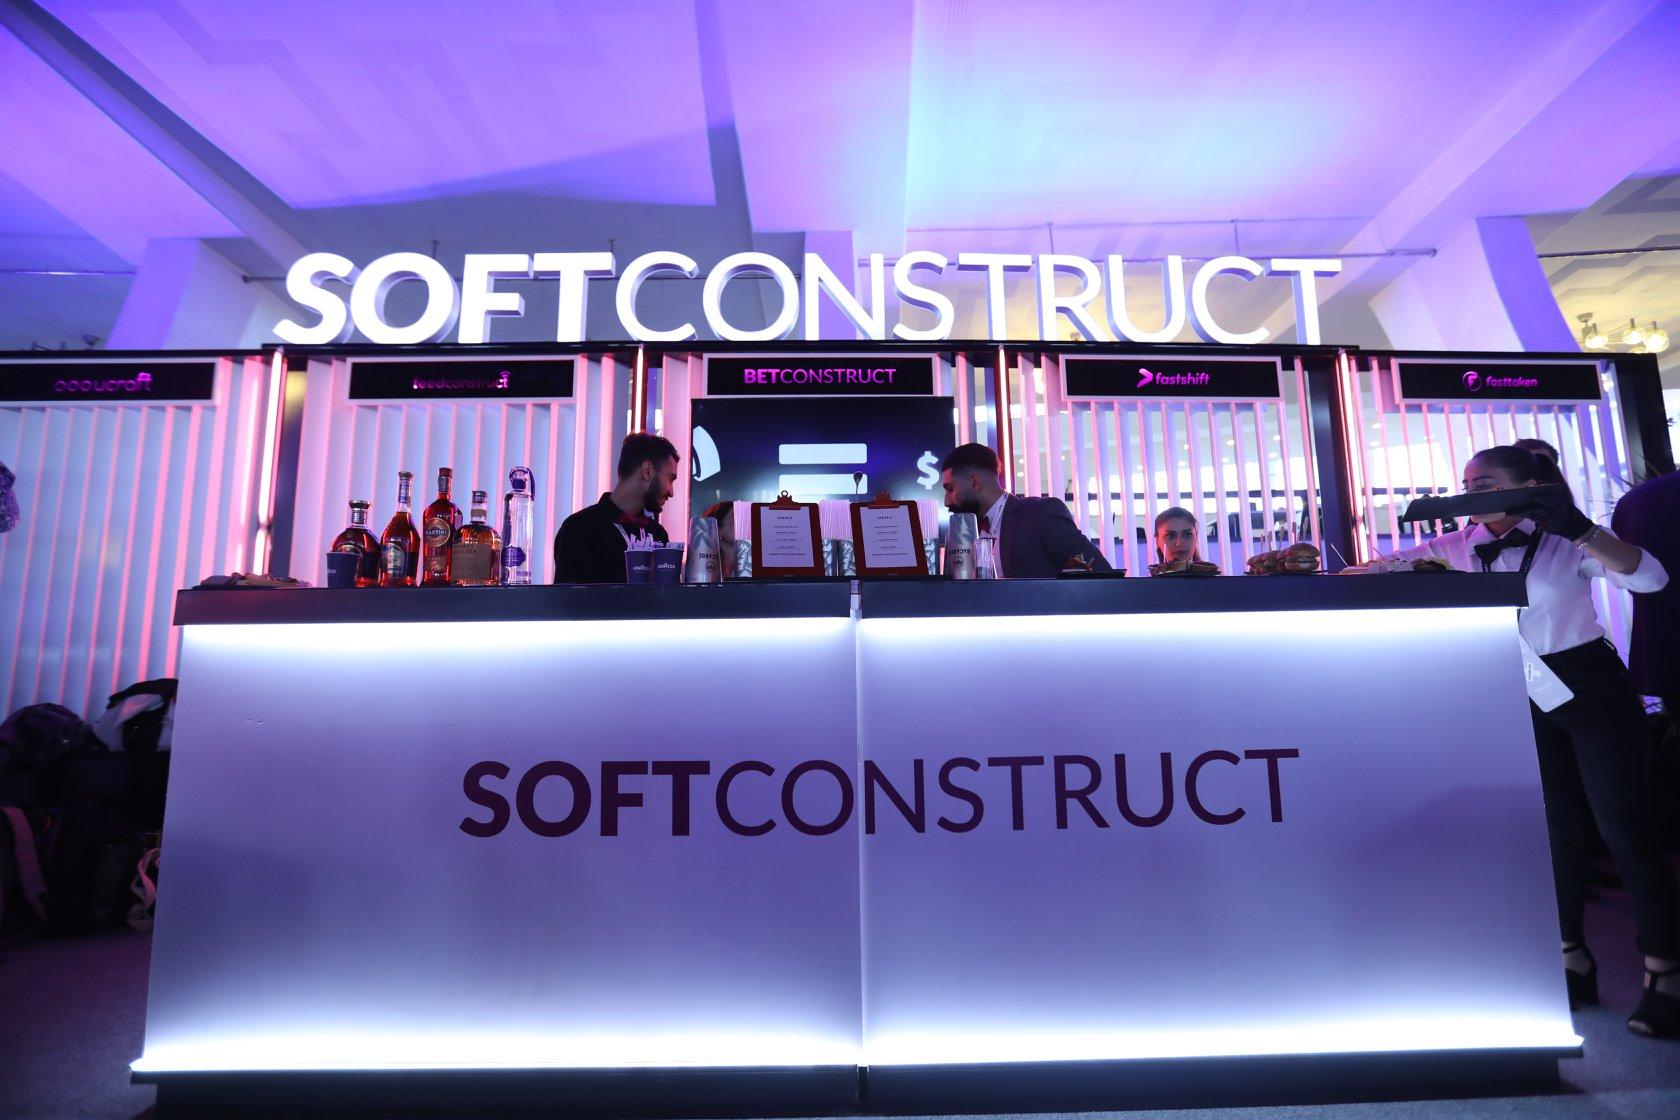 SoftConstruct at WCIT 2019 Yerevan